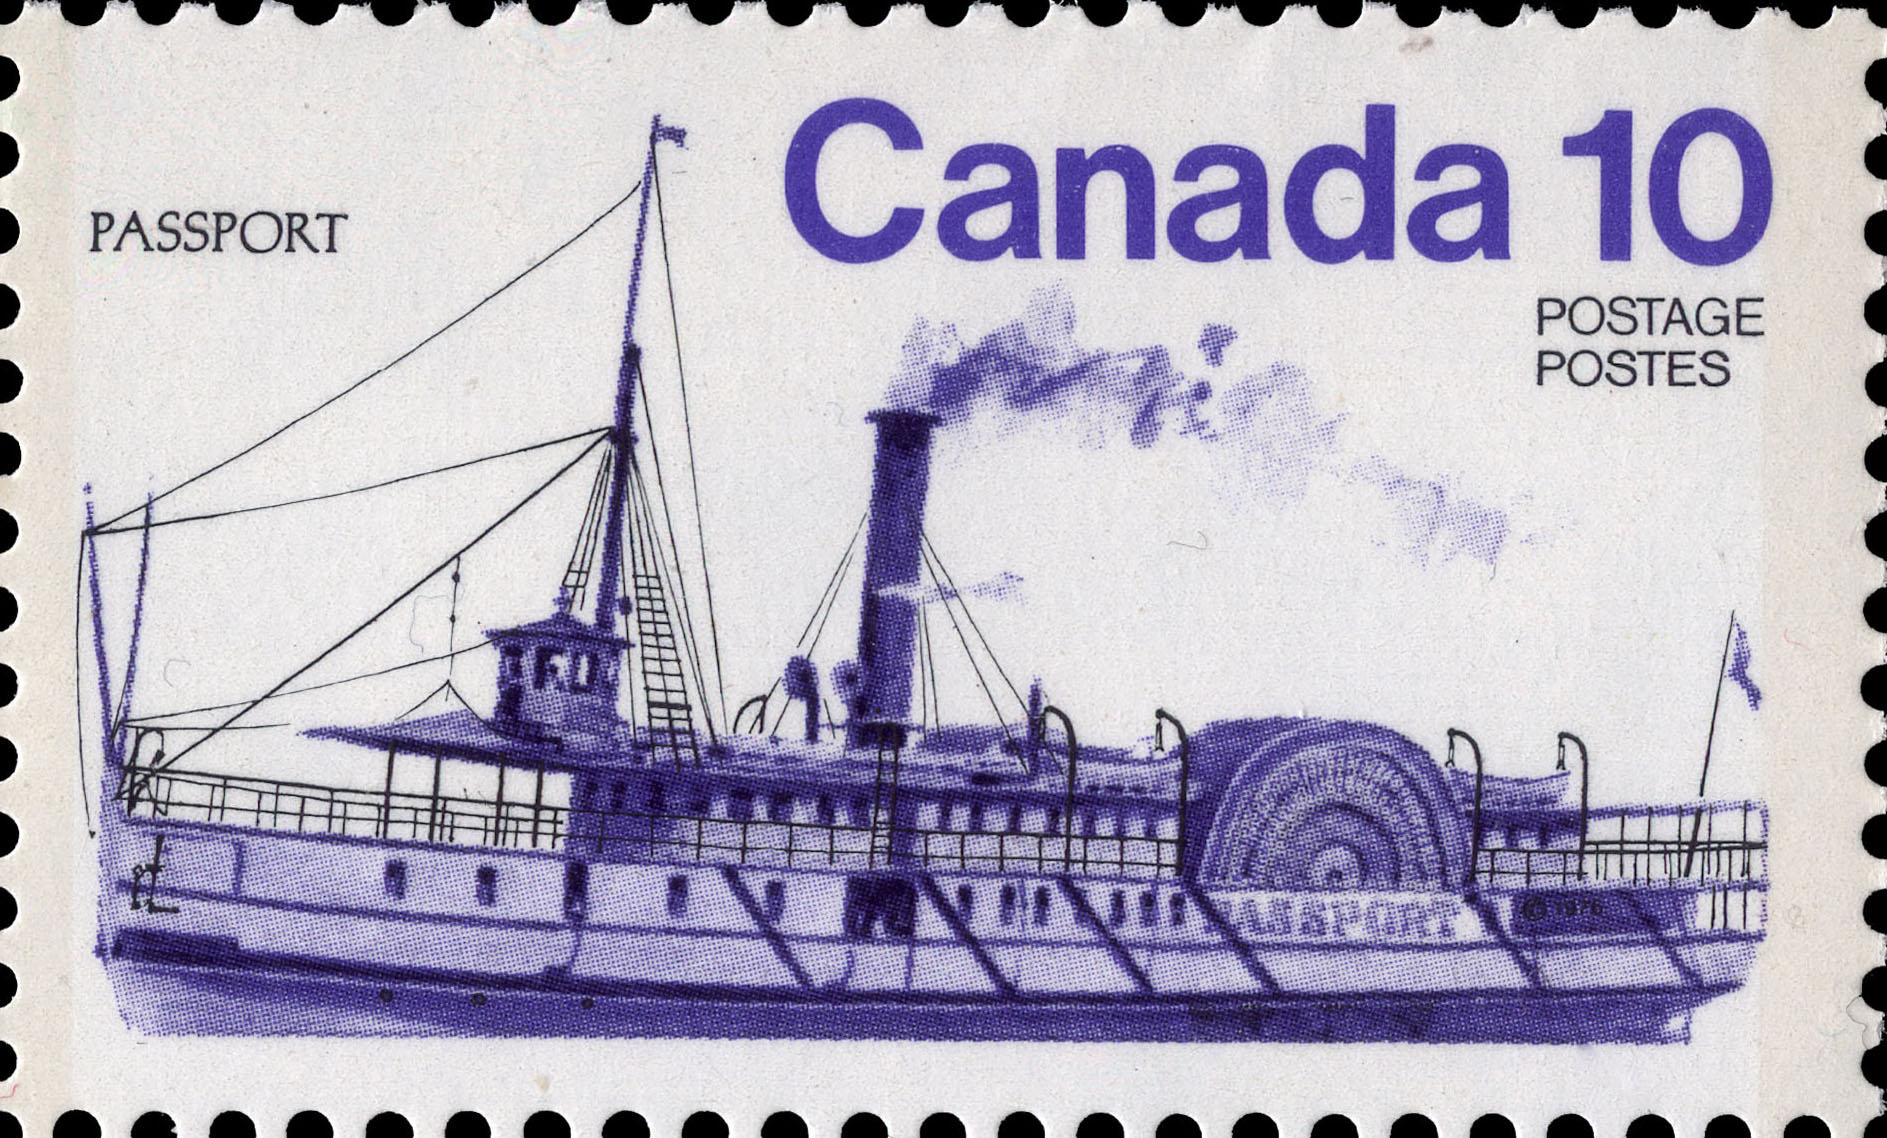 Passport Canada Postage Stamp